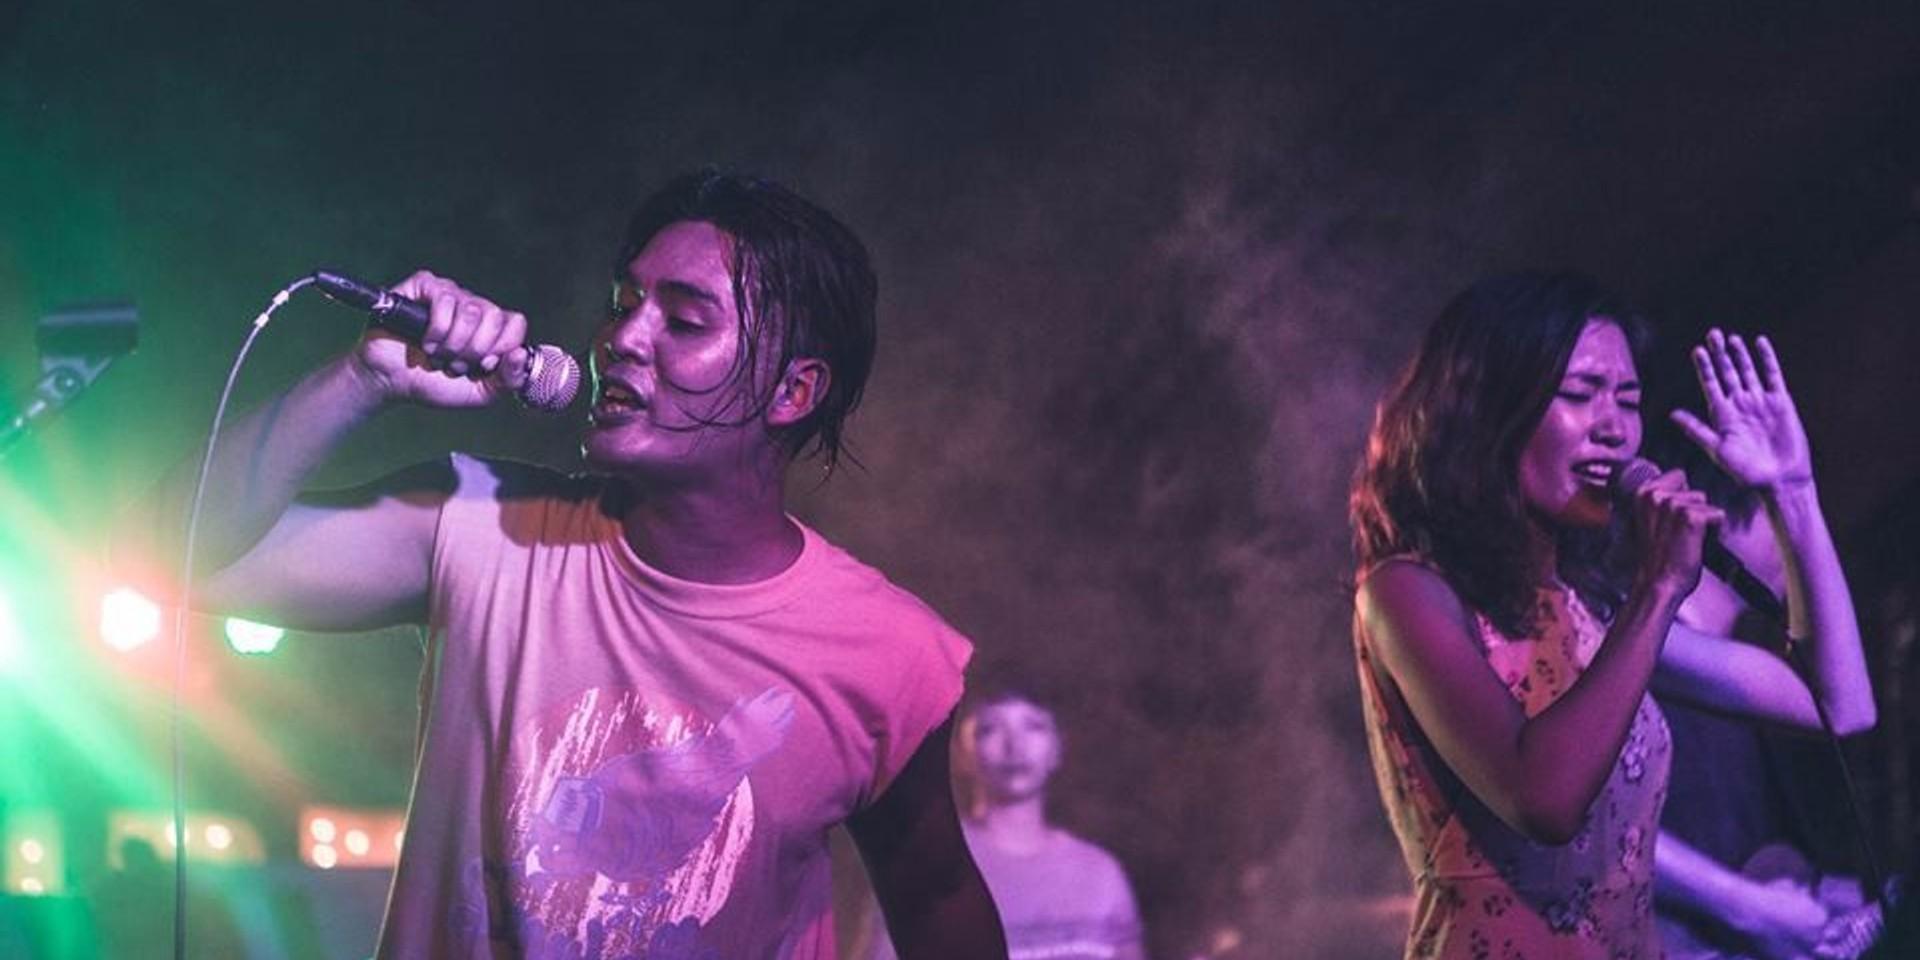 Moonwlk to make Cebu debut in November